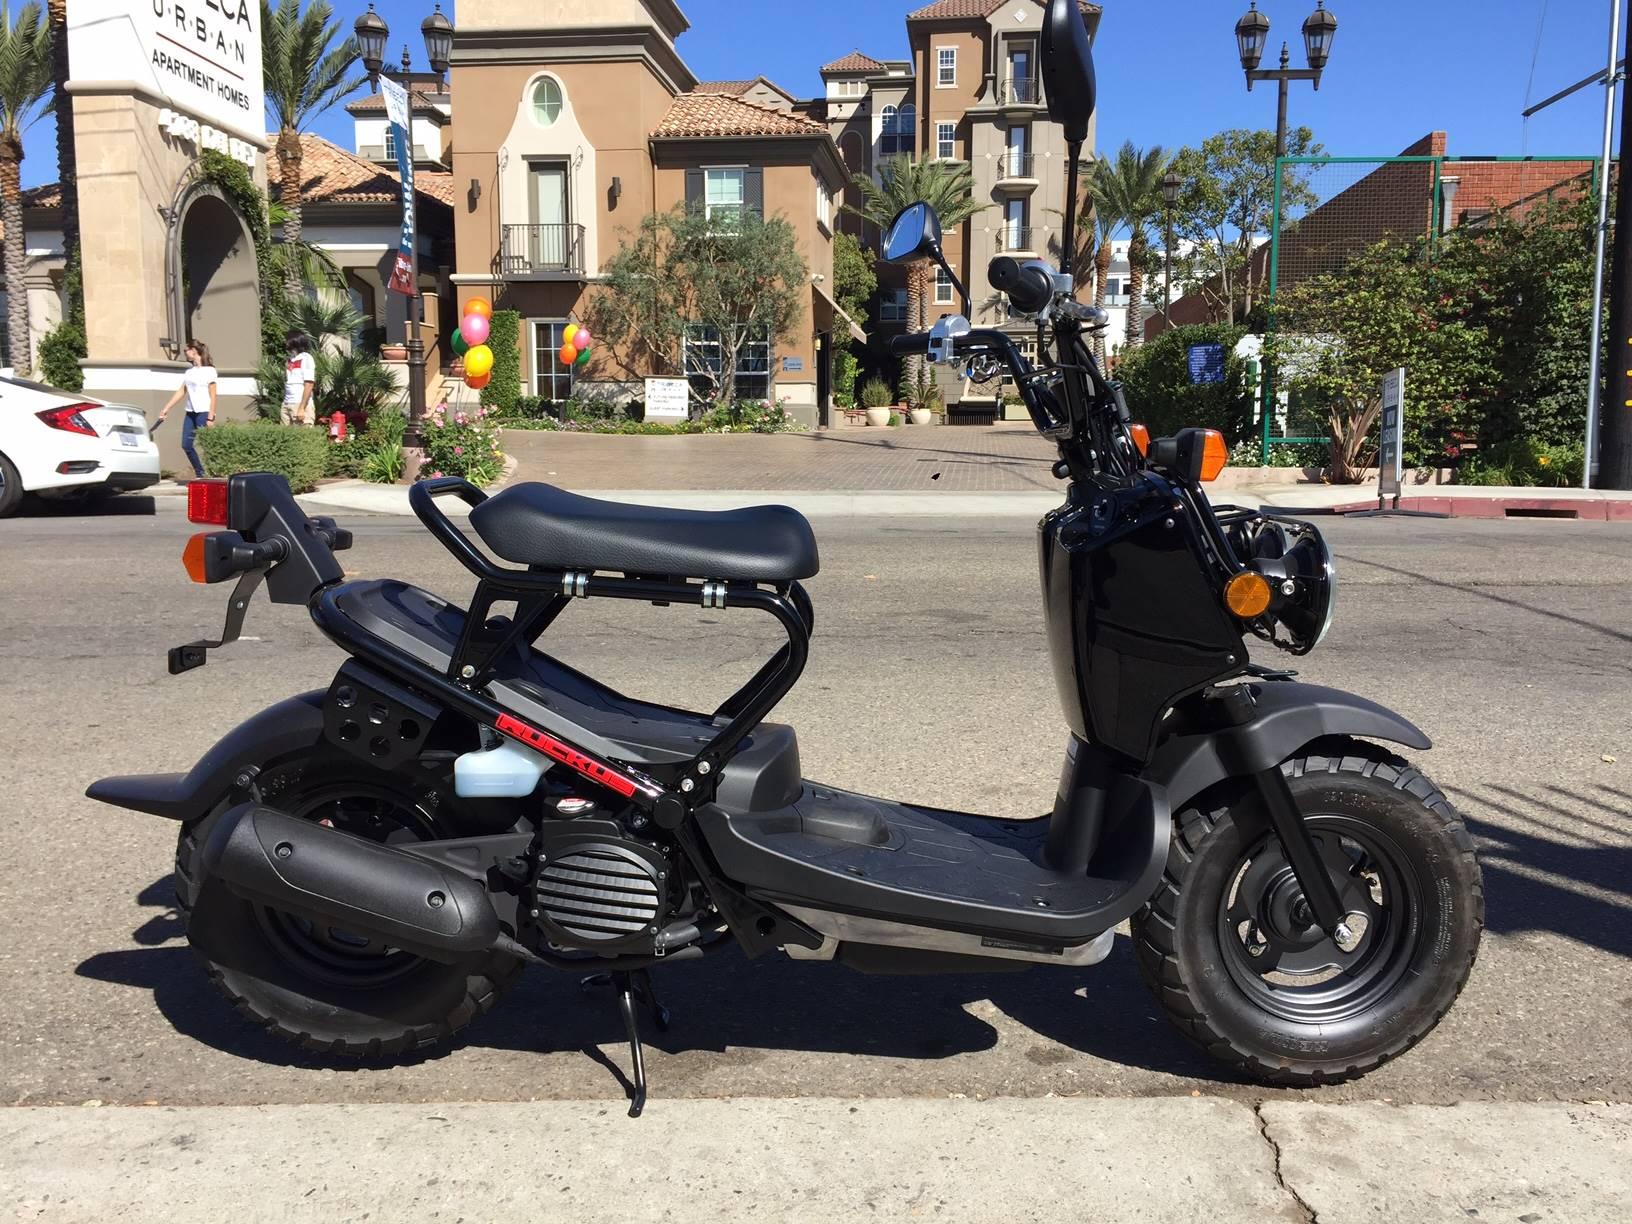 2017 Honda Ruckus Scooters Marina Del Rey California